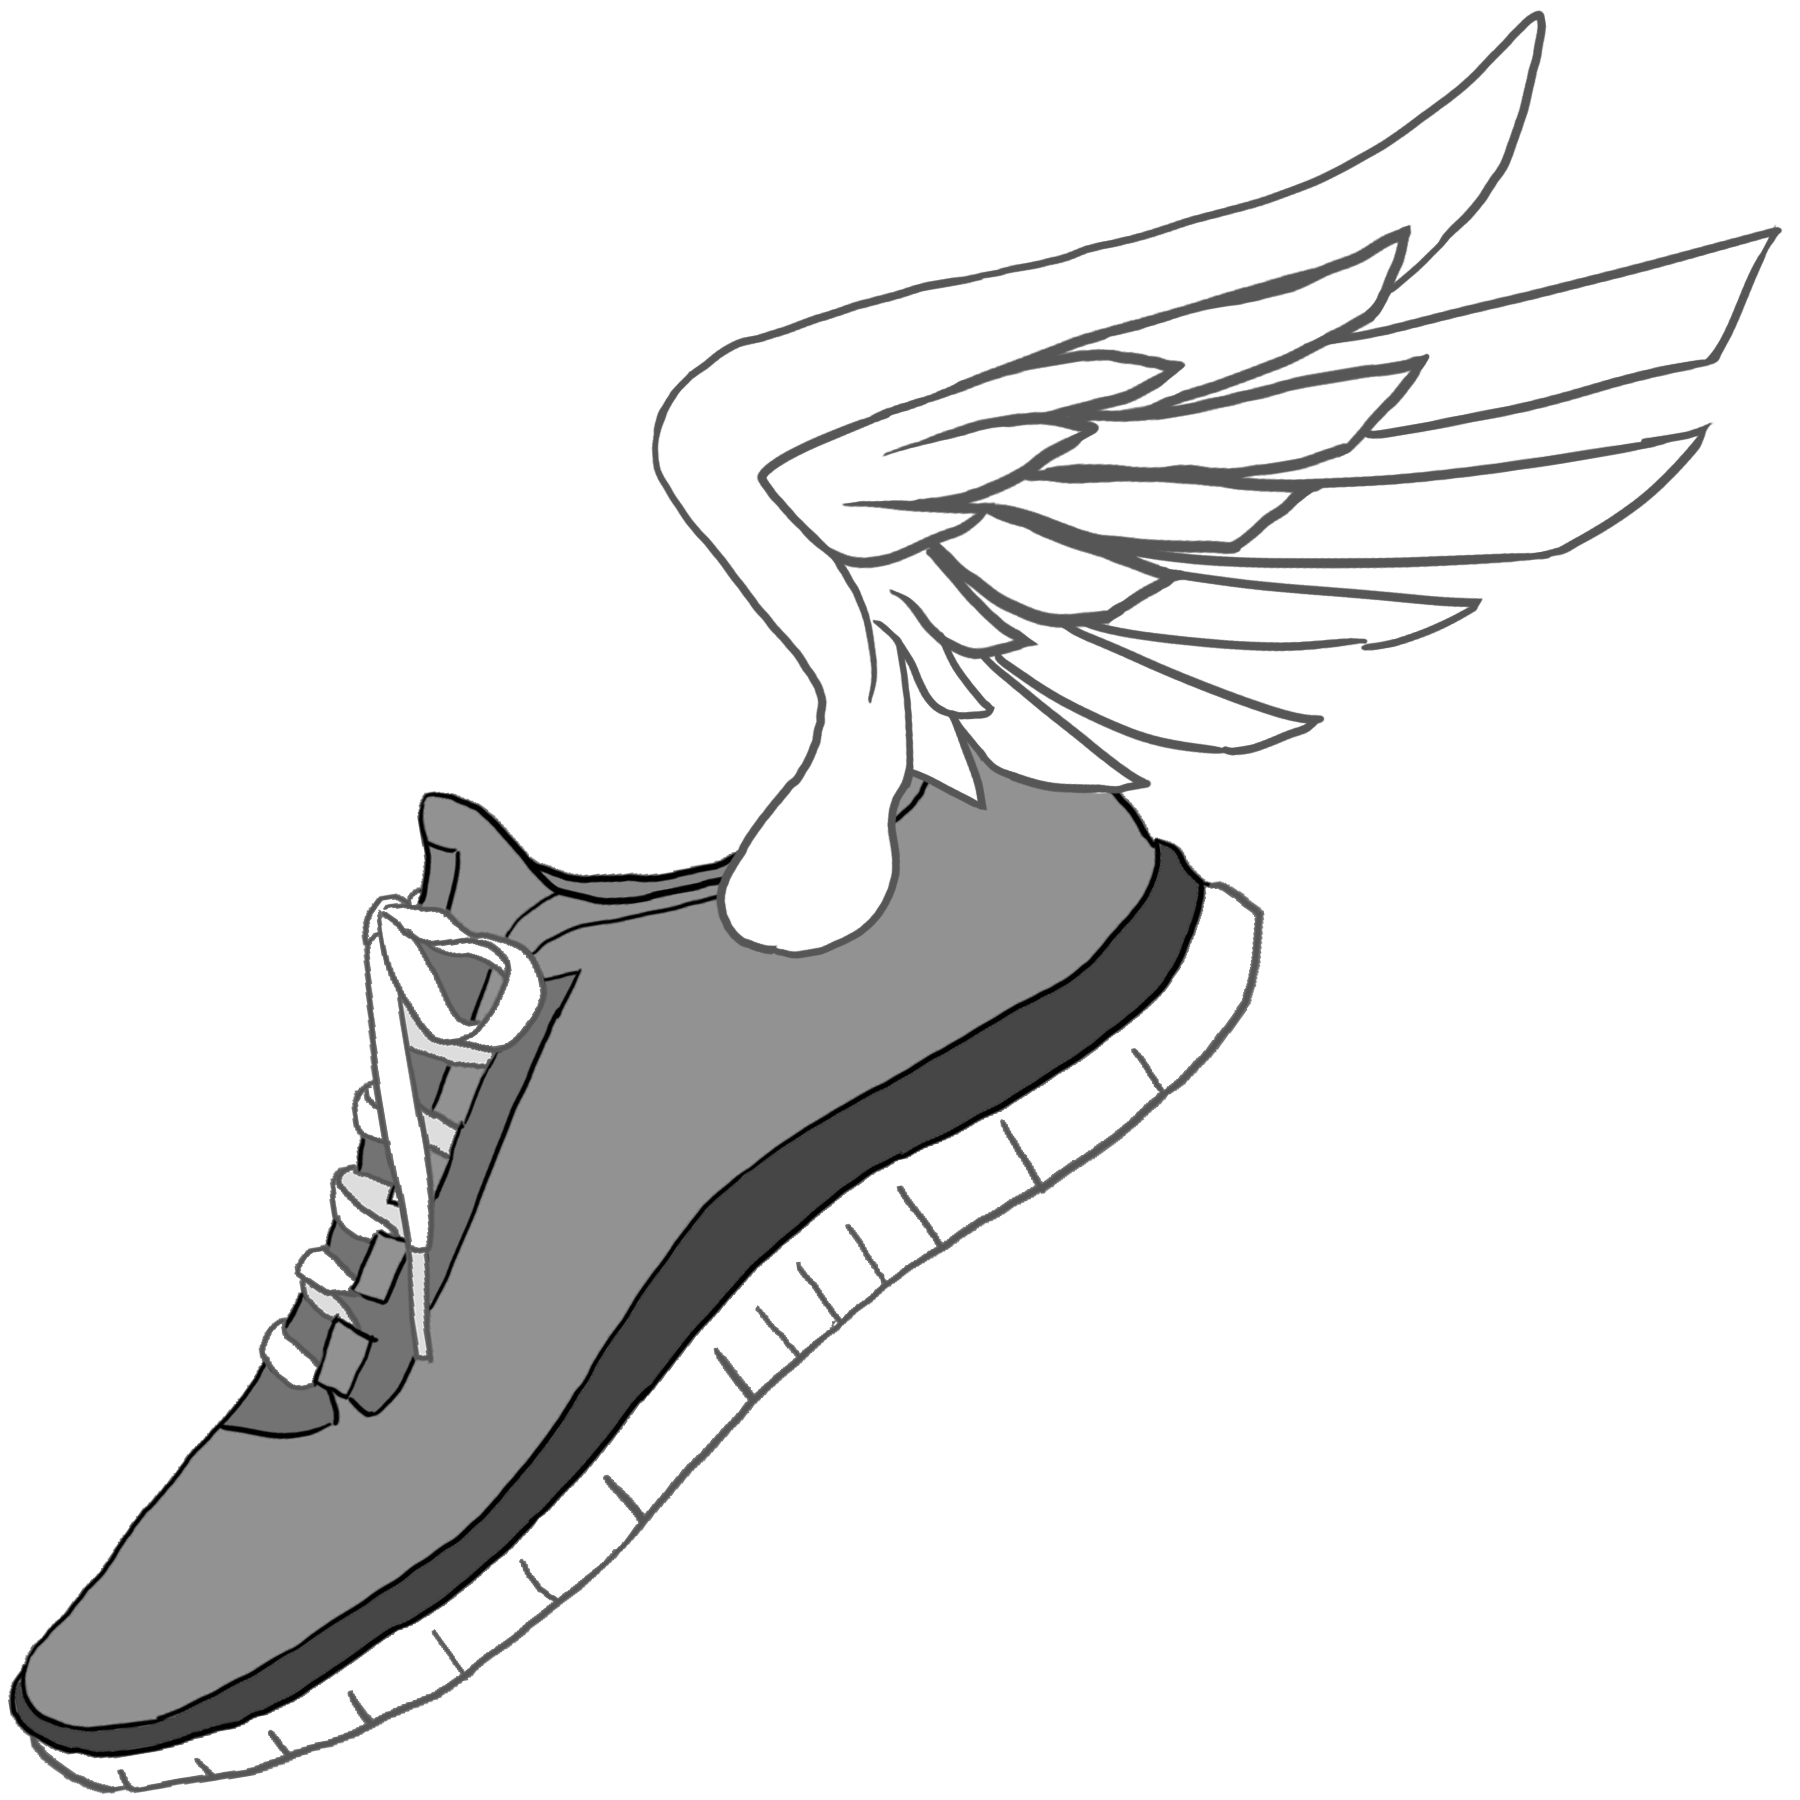 Track shoe running shoe telephone clip art image